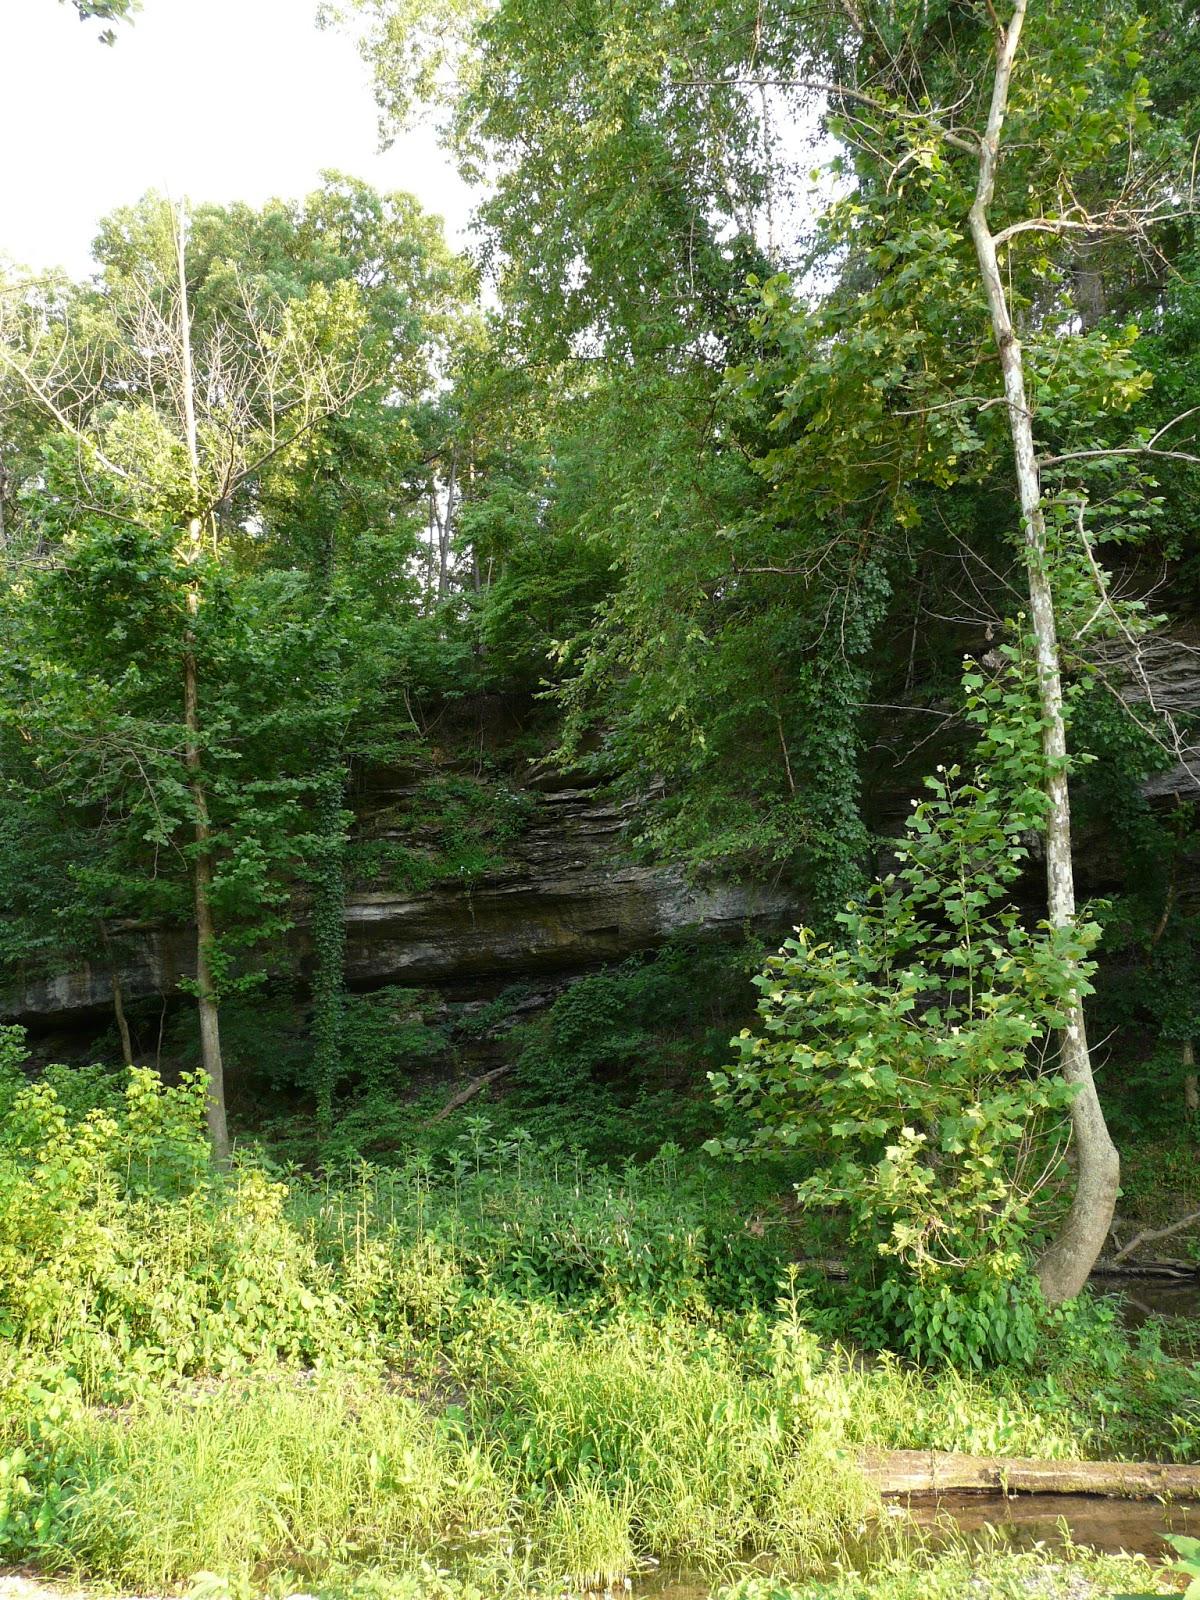 Vacation in Ozark Mountains, Missouri | Bluegreen Vacations  |Ozark Plateau